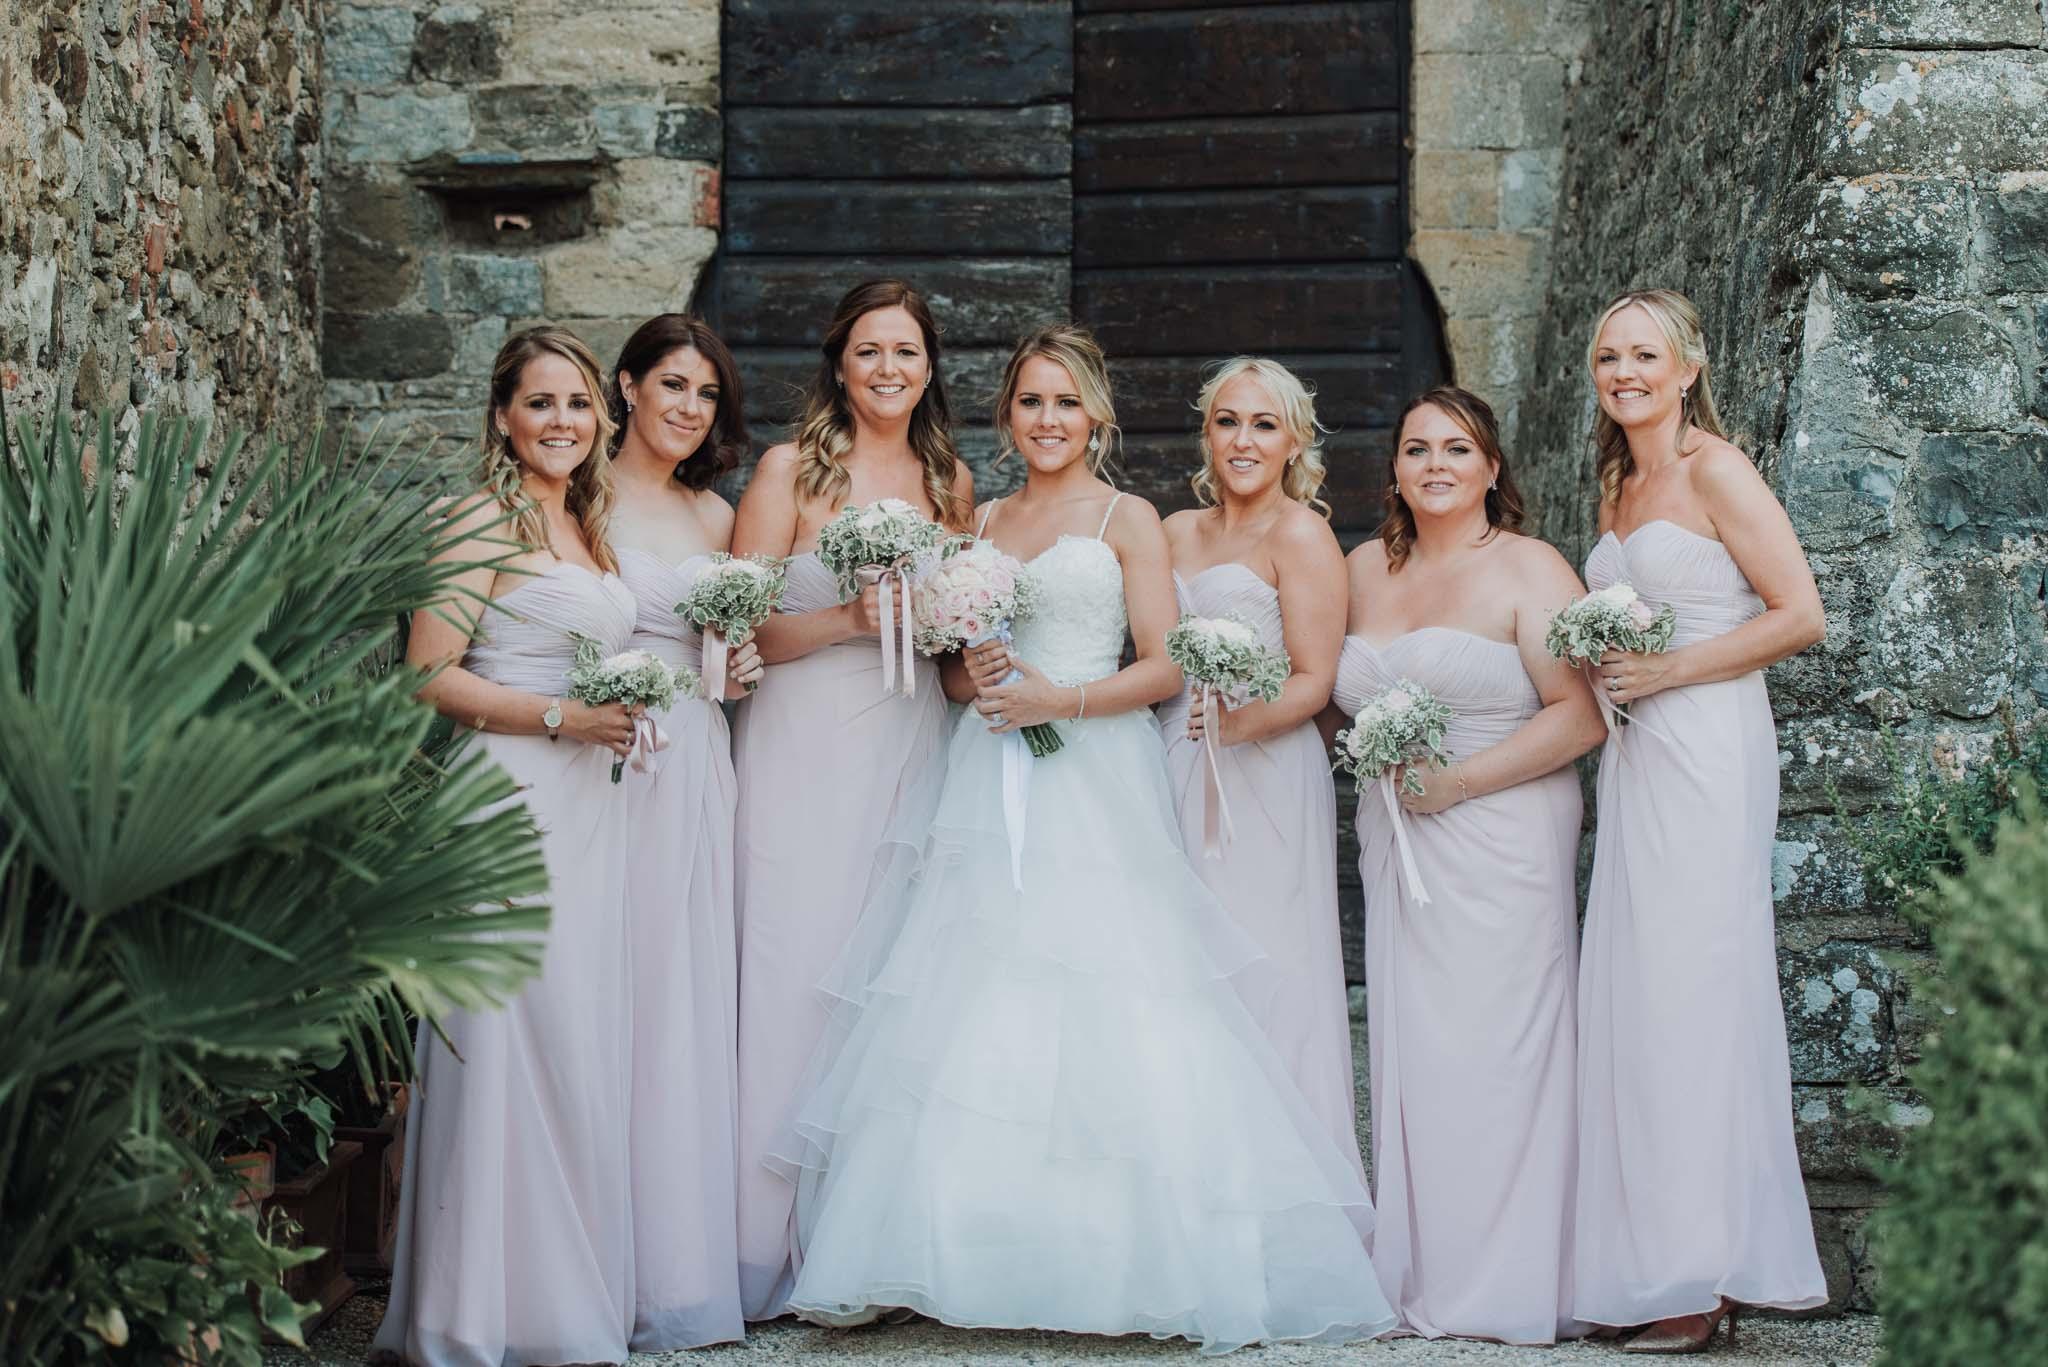 maid of honour duties, bridemaids